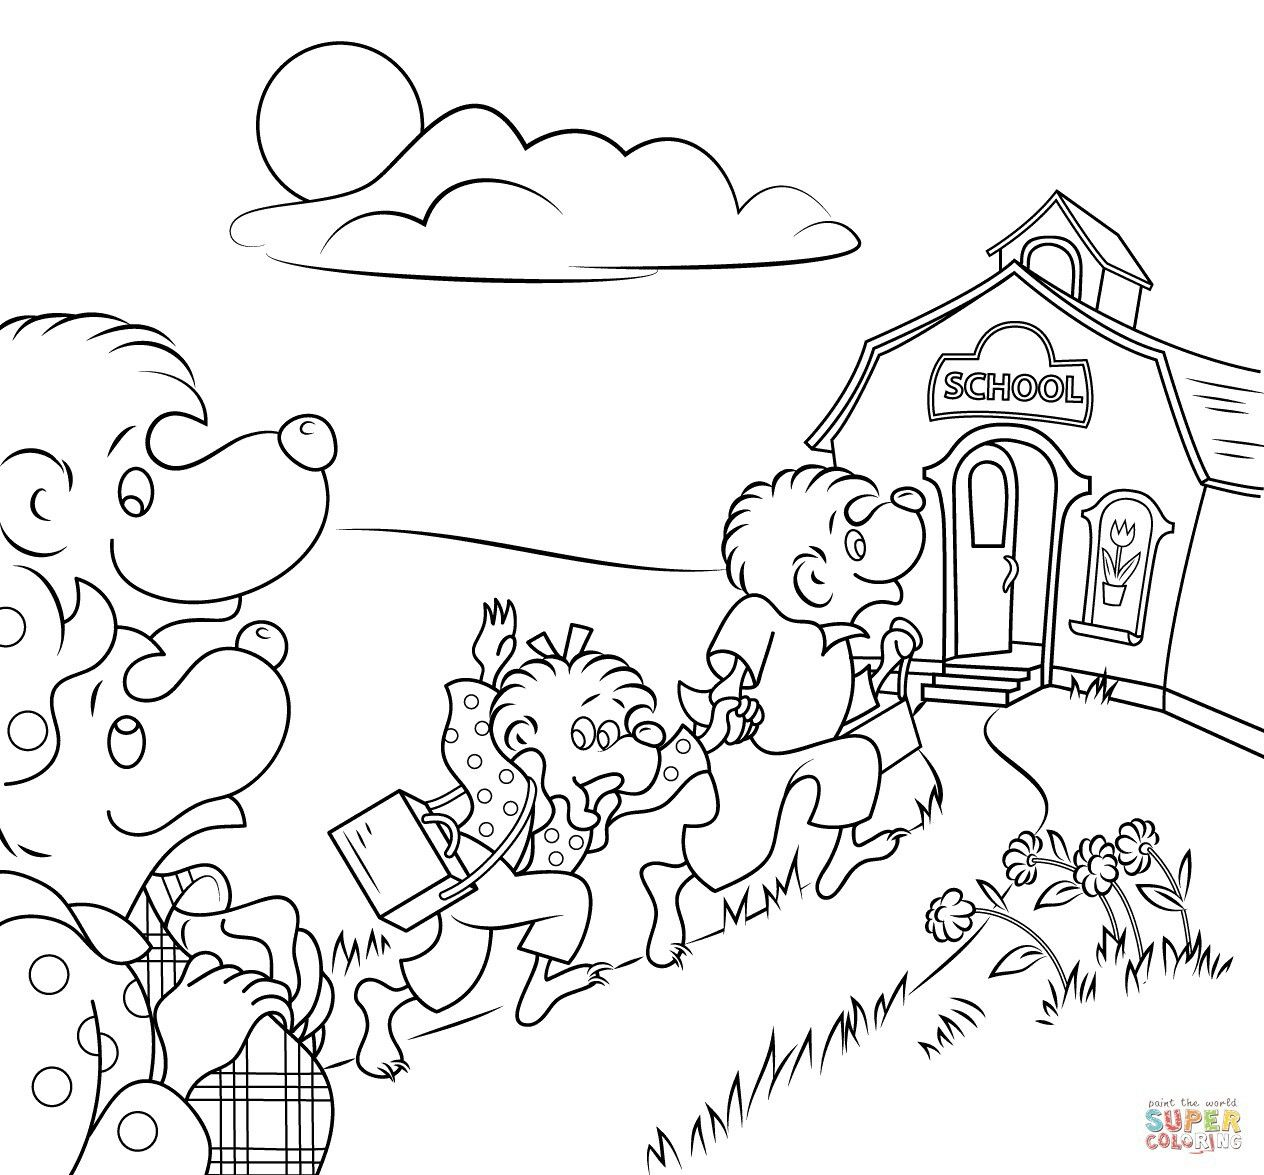 Pin by April Dikty ( Ordoyne) on Berenstain Bears | Pinterest ...